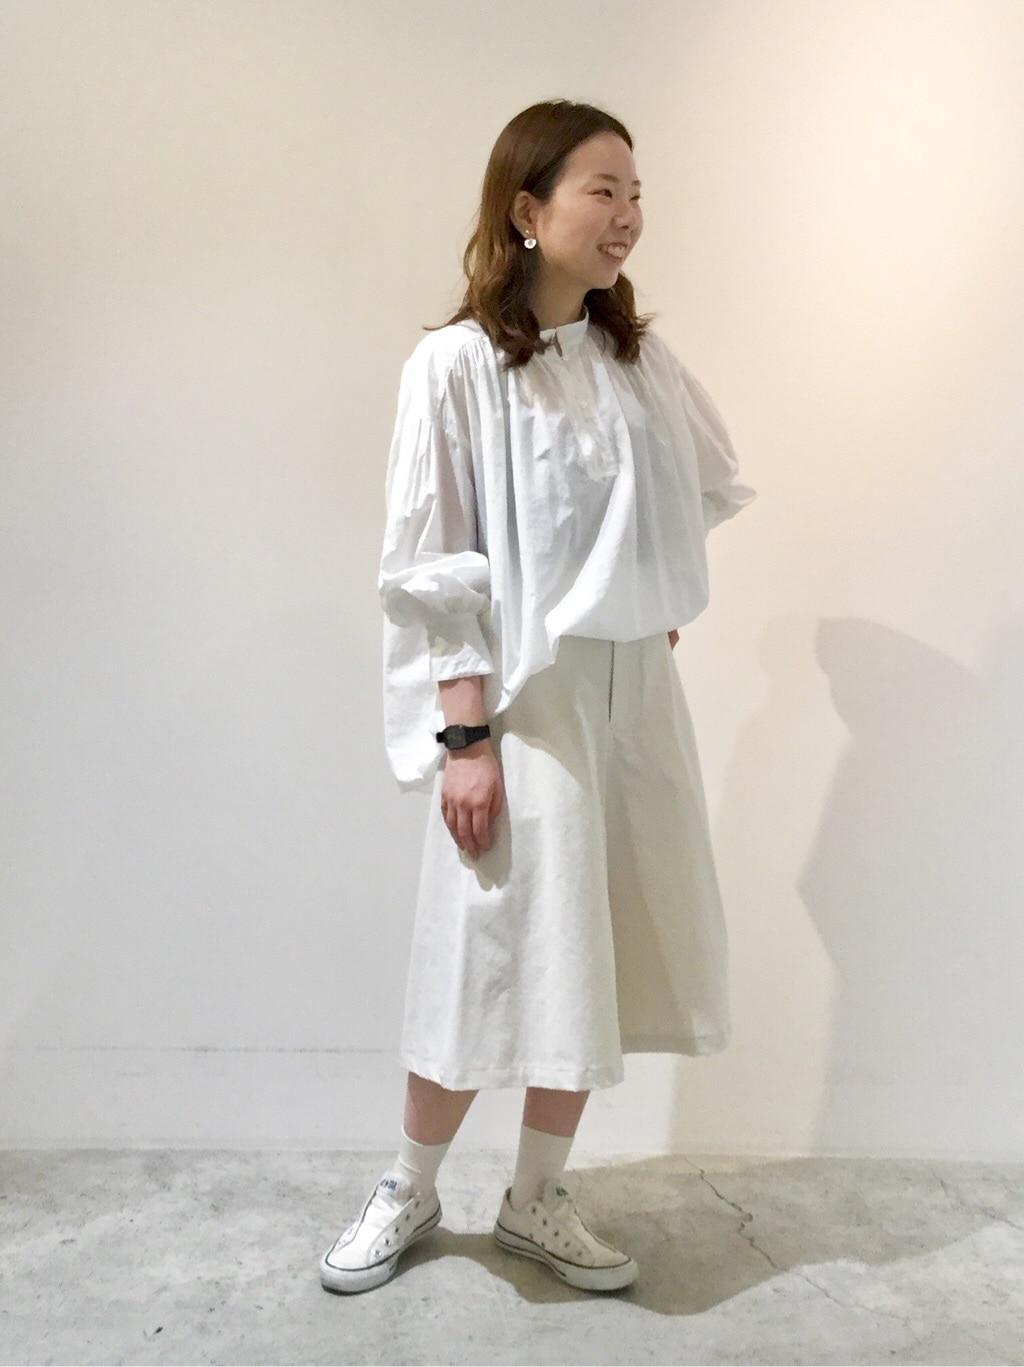 chambre de charme 京都路面 身長:155cm 2020.05.01